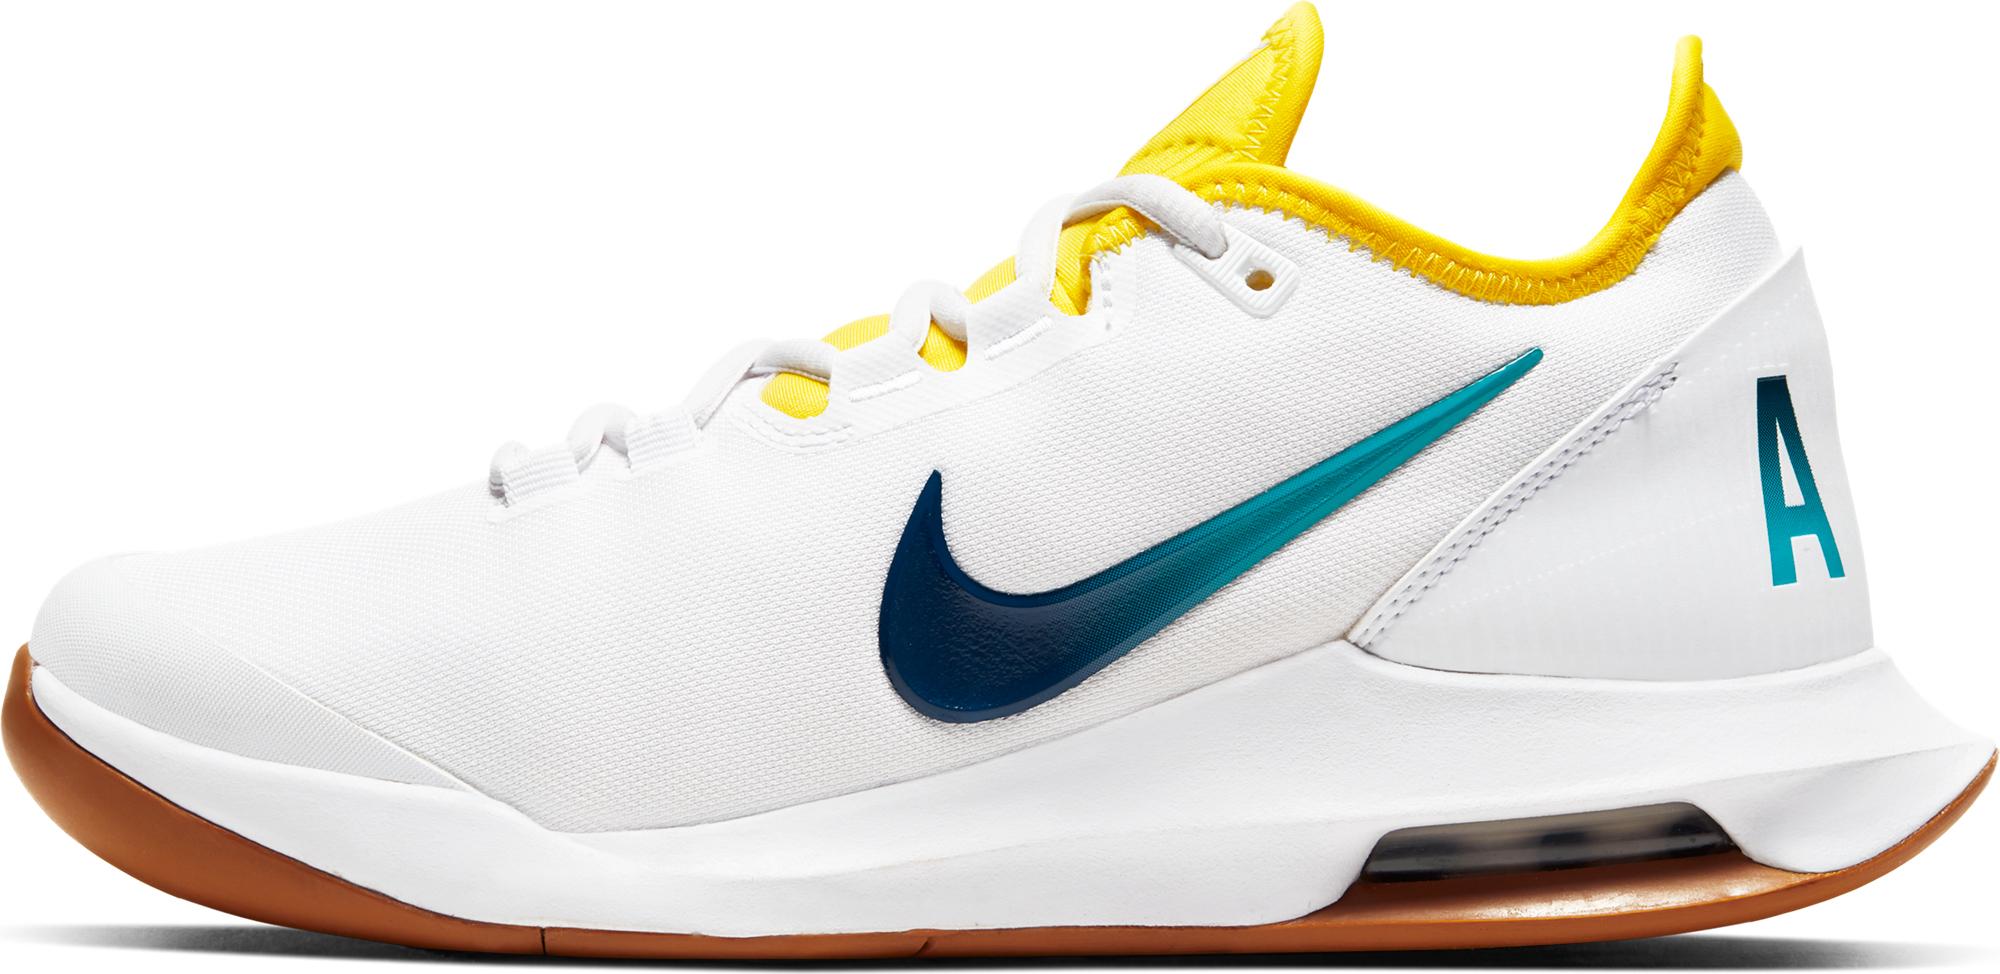 Nike Кроссовки женские Nike Air Max Wildcard Hc, размер 37